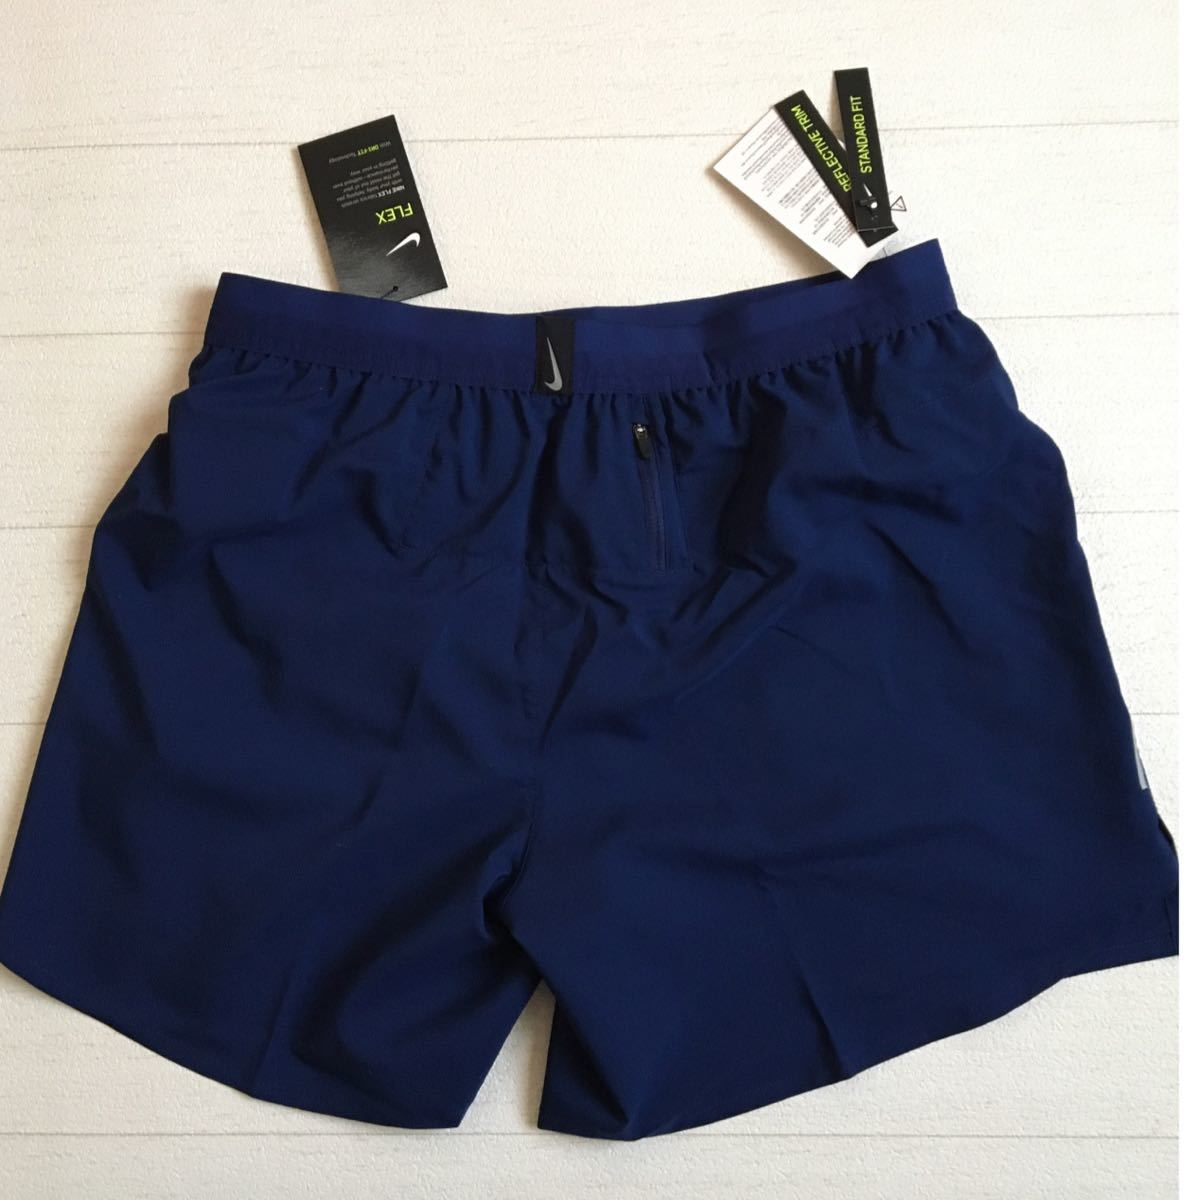 NIKE ランニング ハーフパンツ紺 メンズS 後ろポッケ付き インナーパンツ付